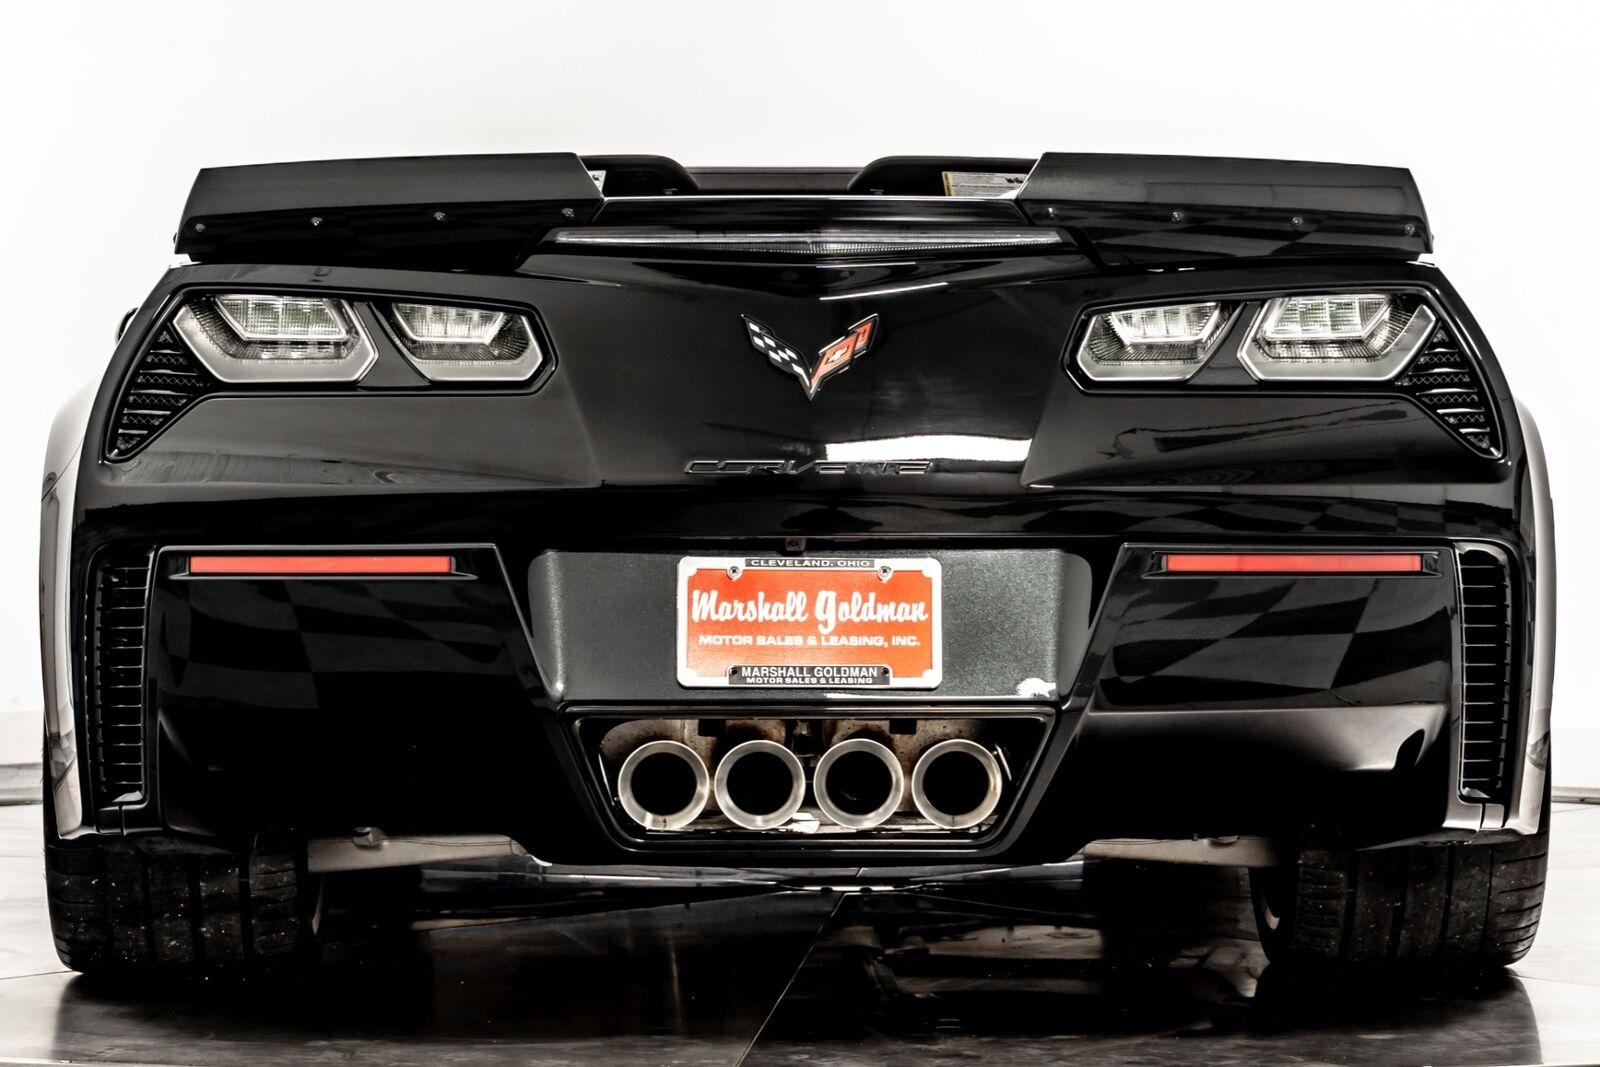 2015 Black Chevrolet Corvette Z06 3LZ   C7 Corvette Photo 7